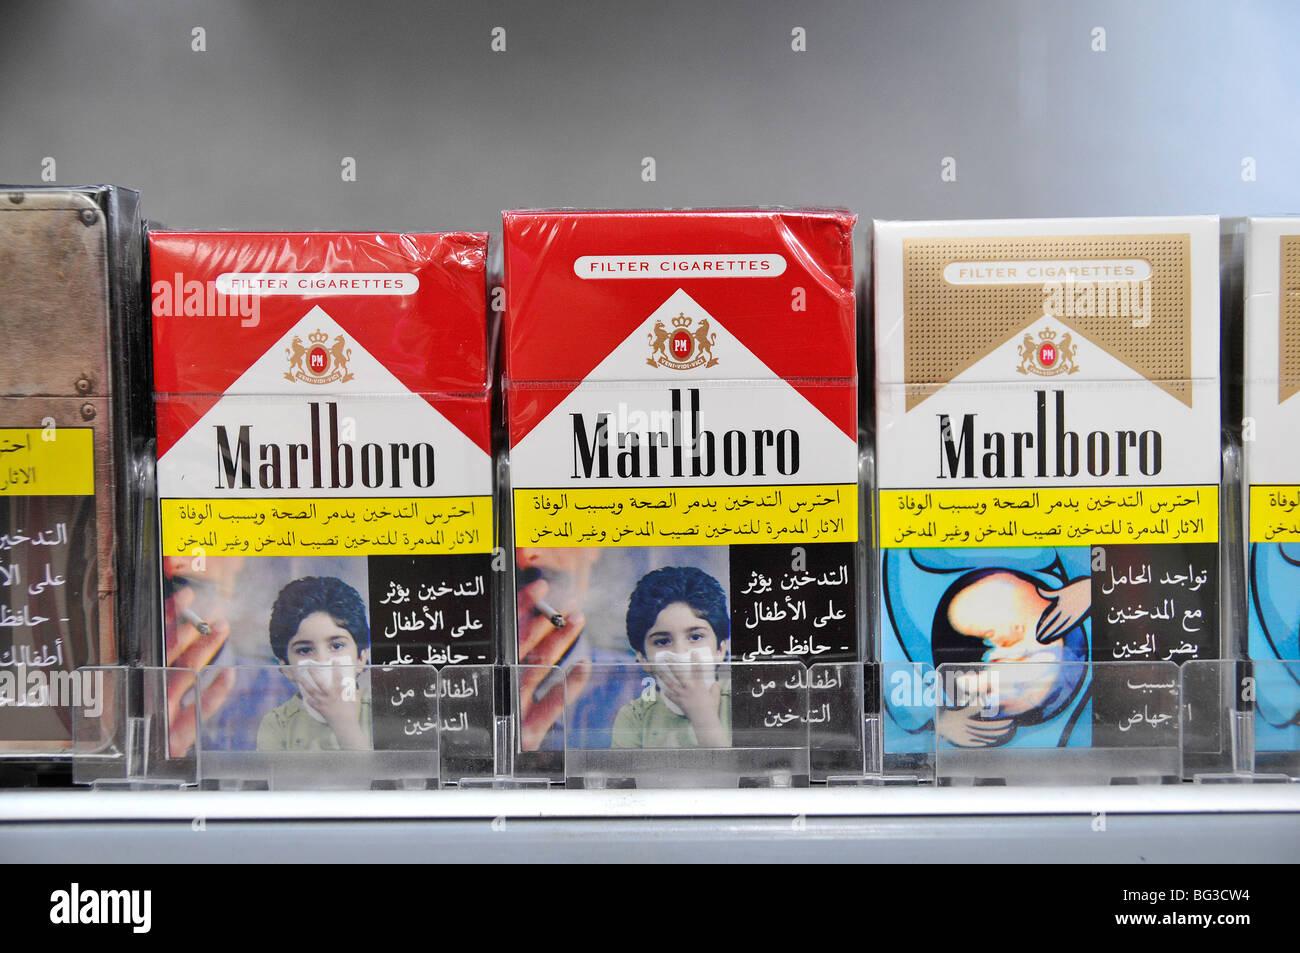 Buy online cigarettes Marlboro Massachusetts